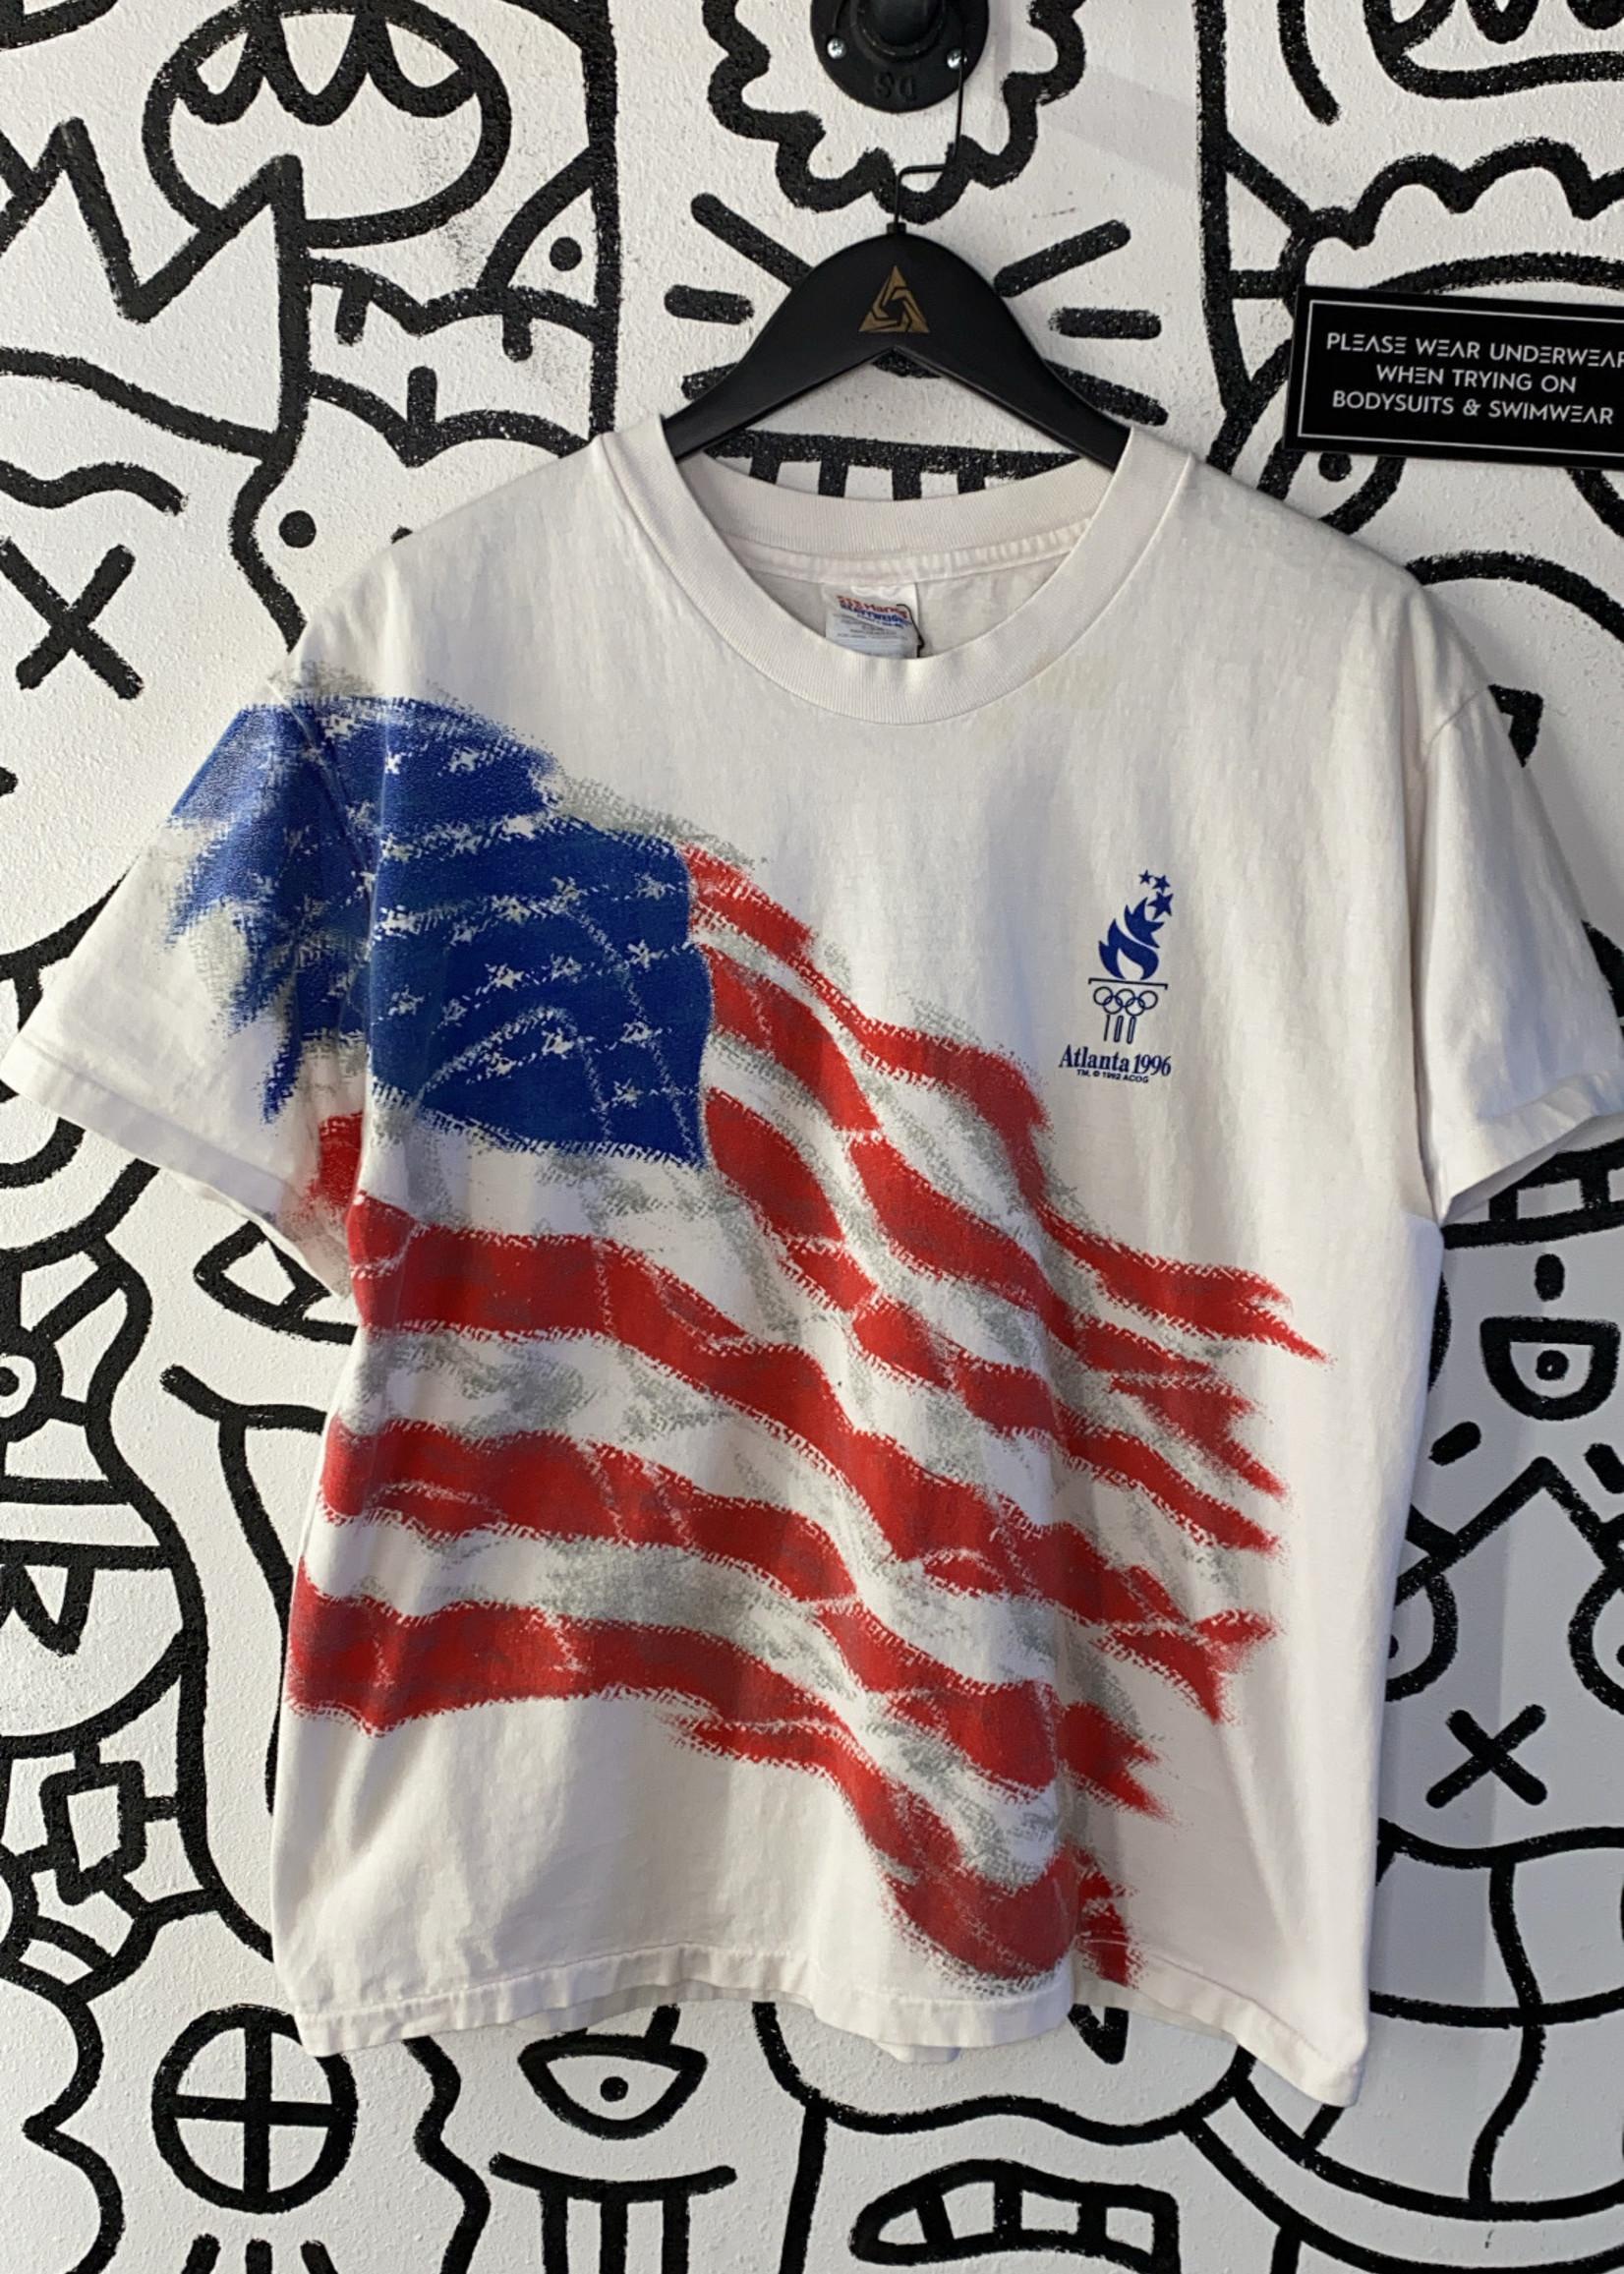 Atlanta 1996 Vintage American Flag Tee L